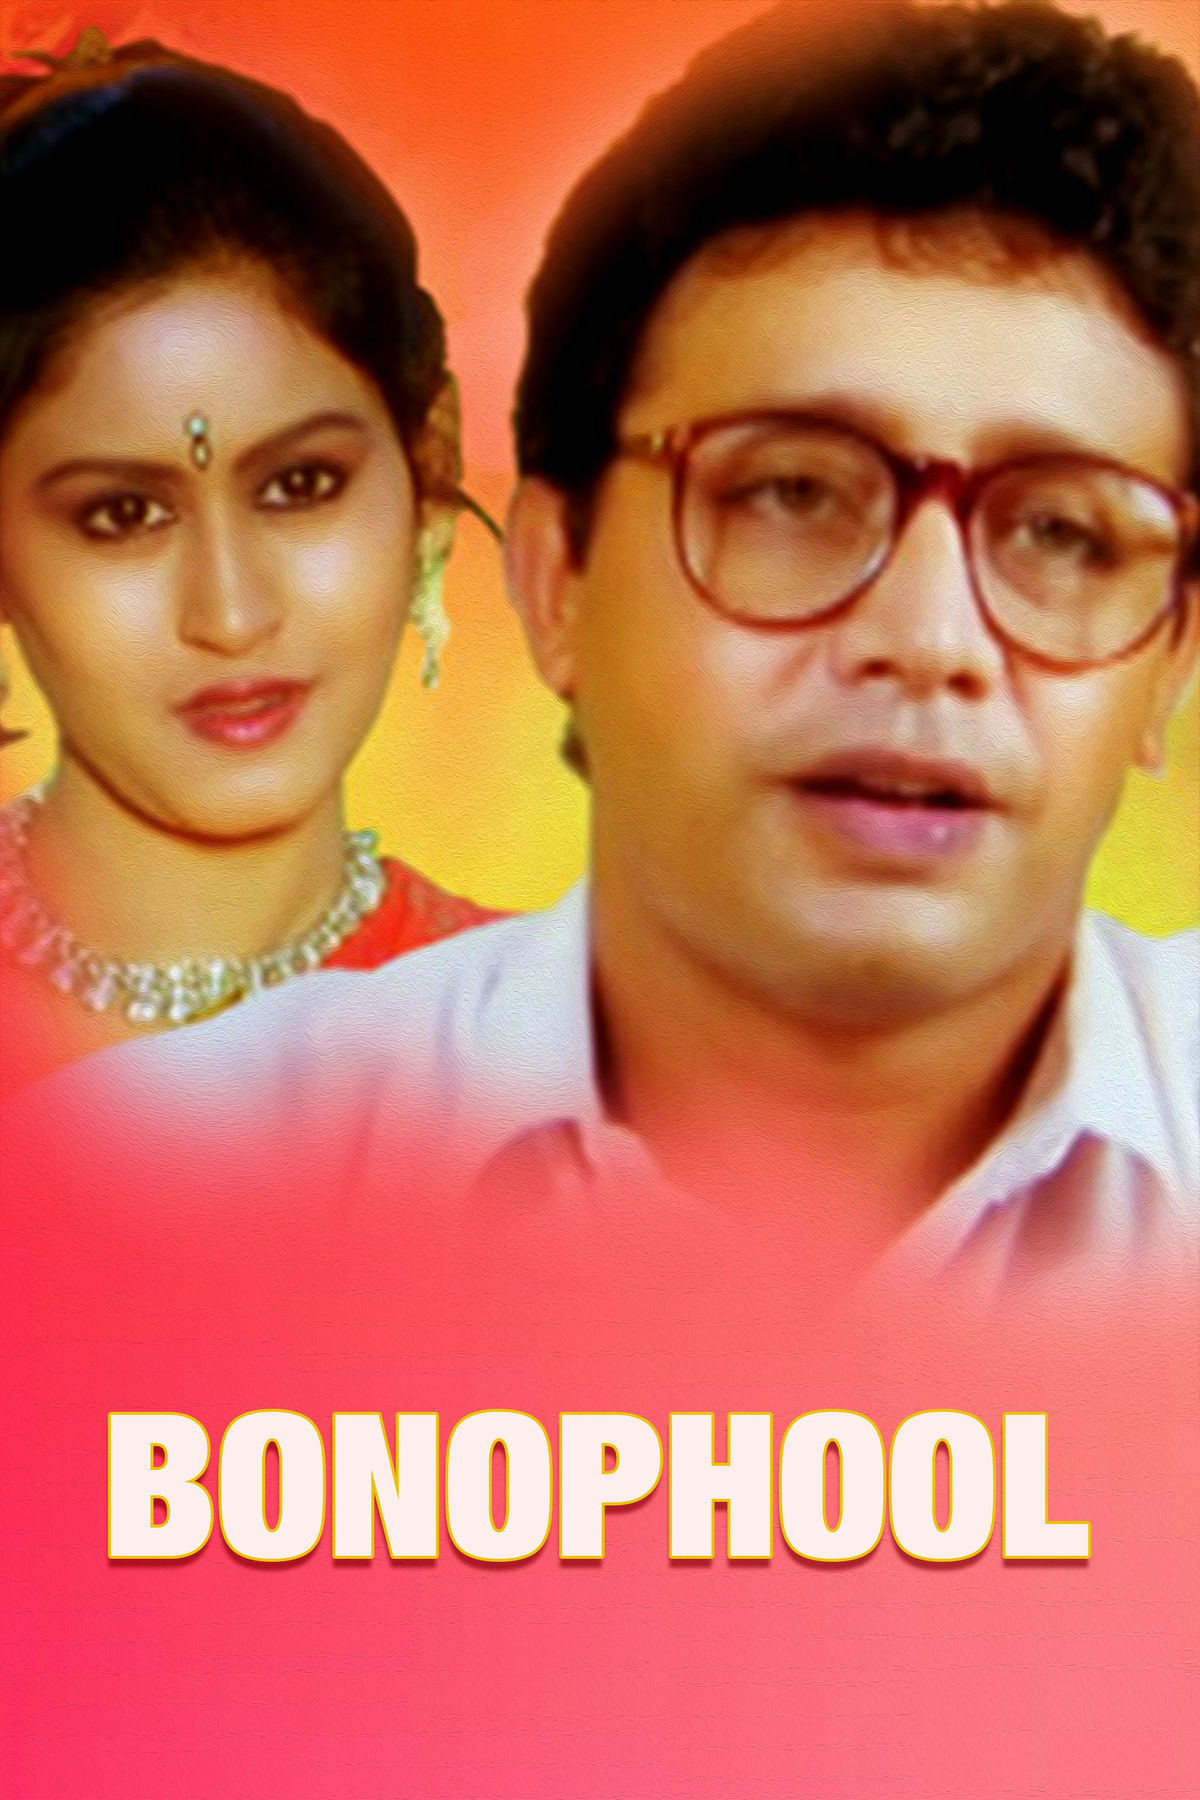 Bonophool